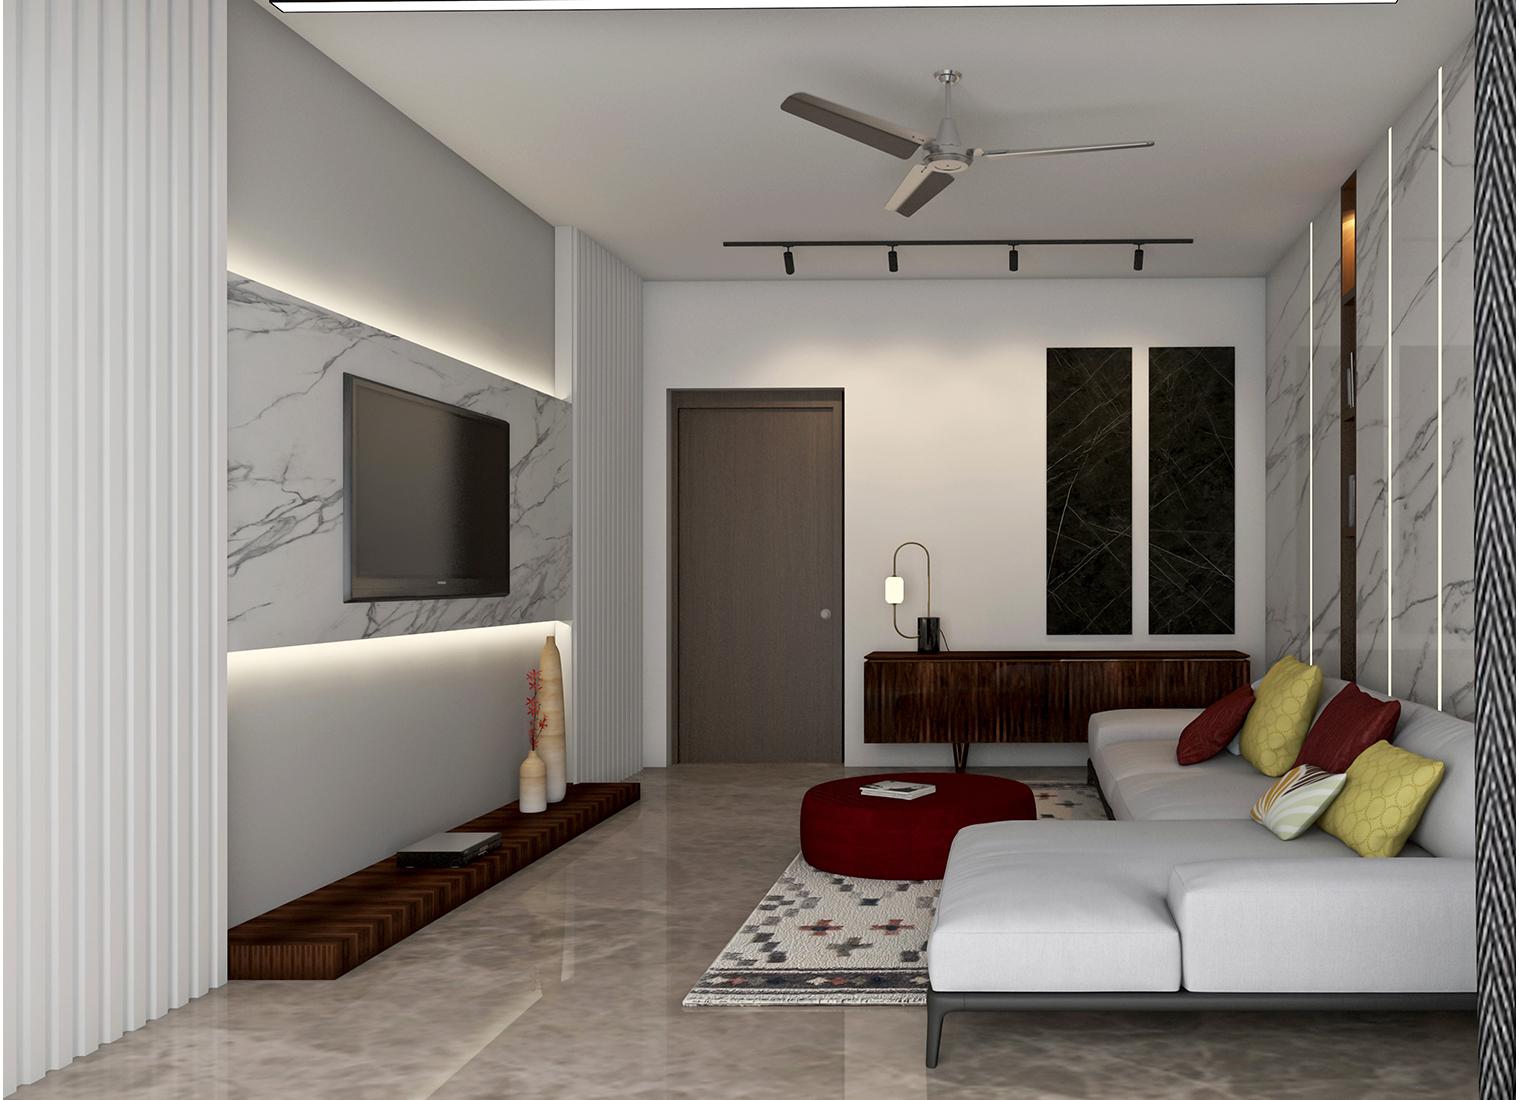 warp architects_svb's interiors (7).jpg